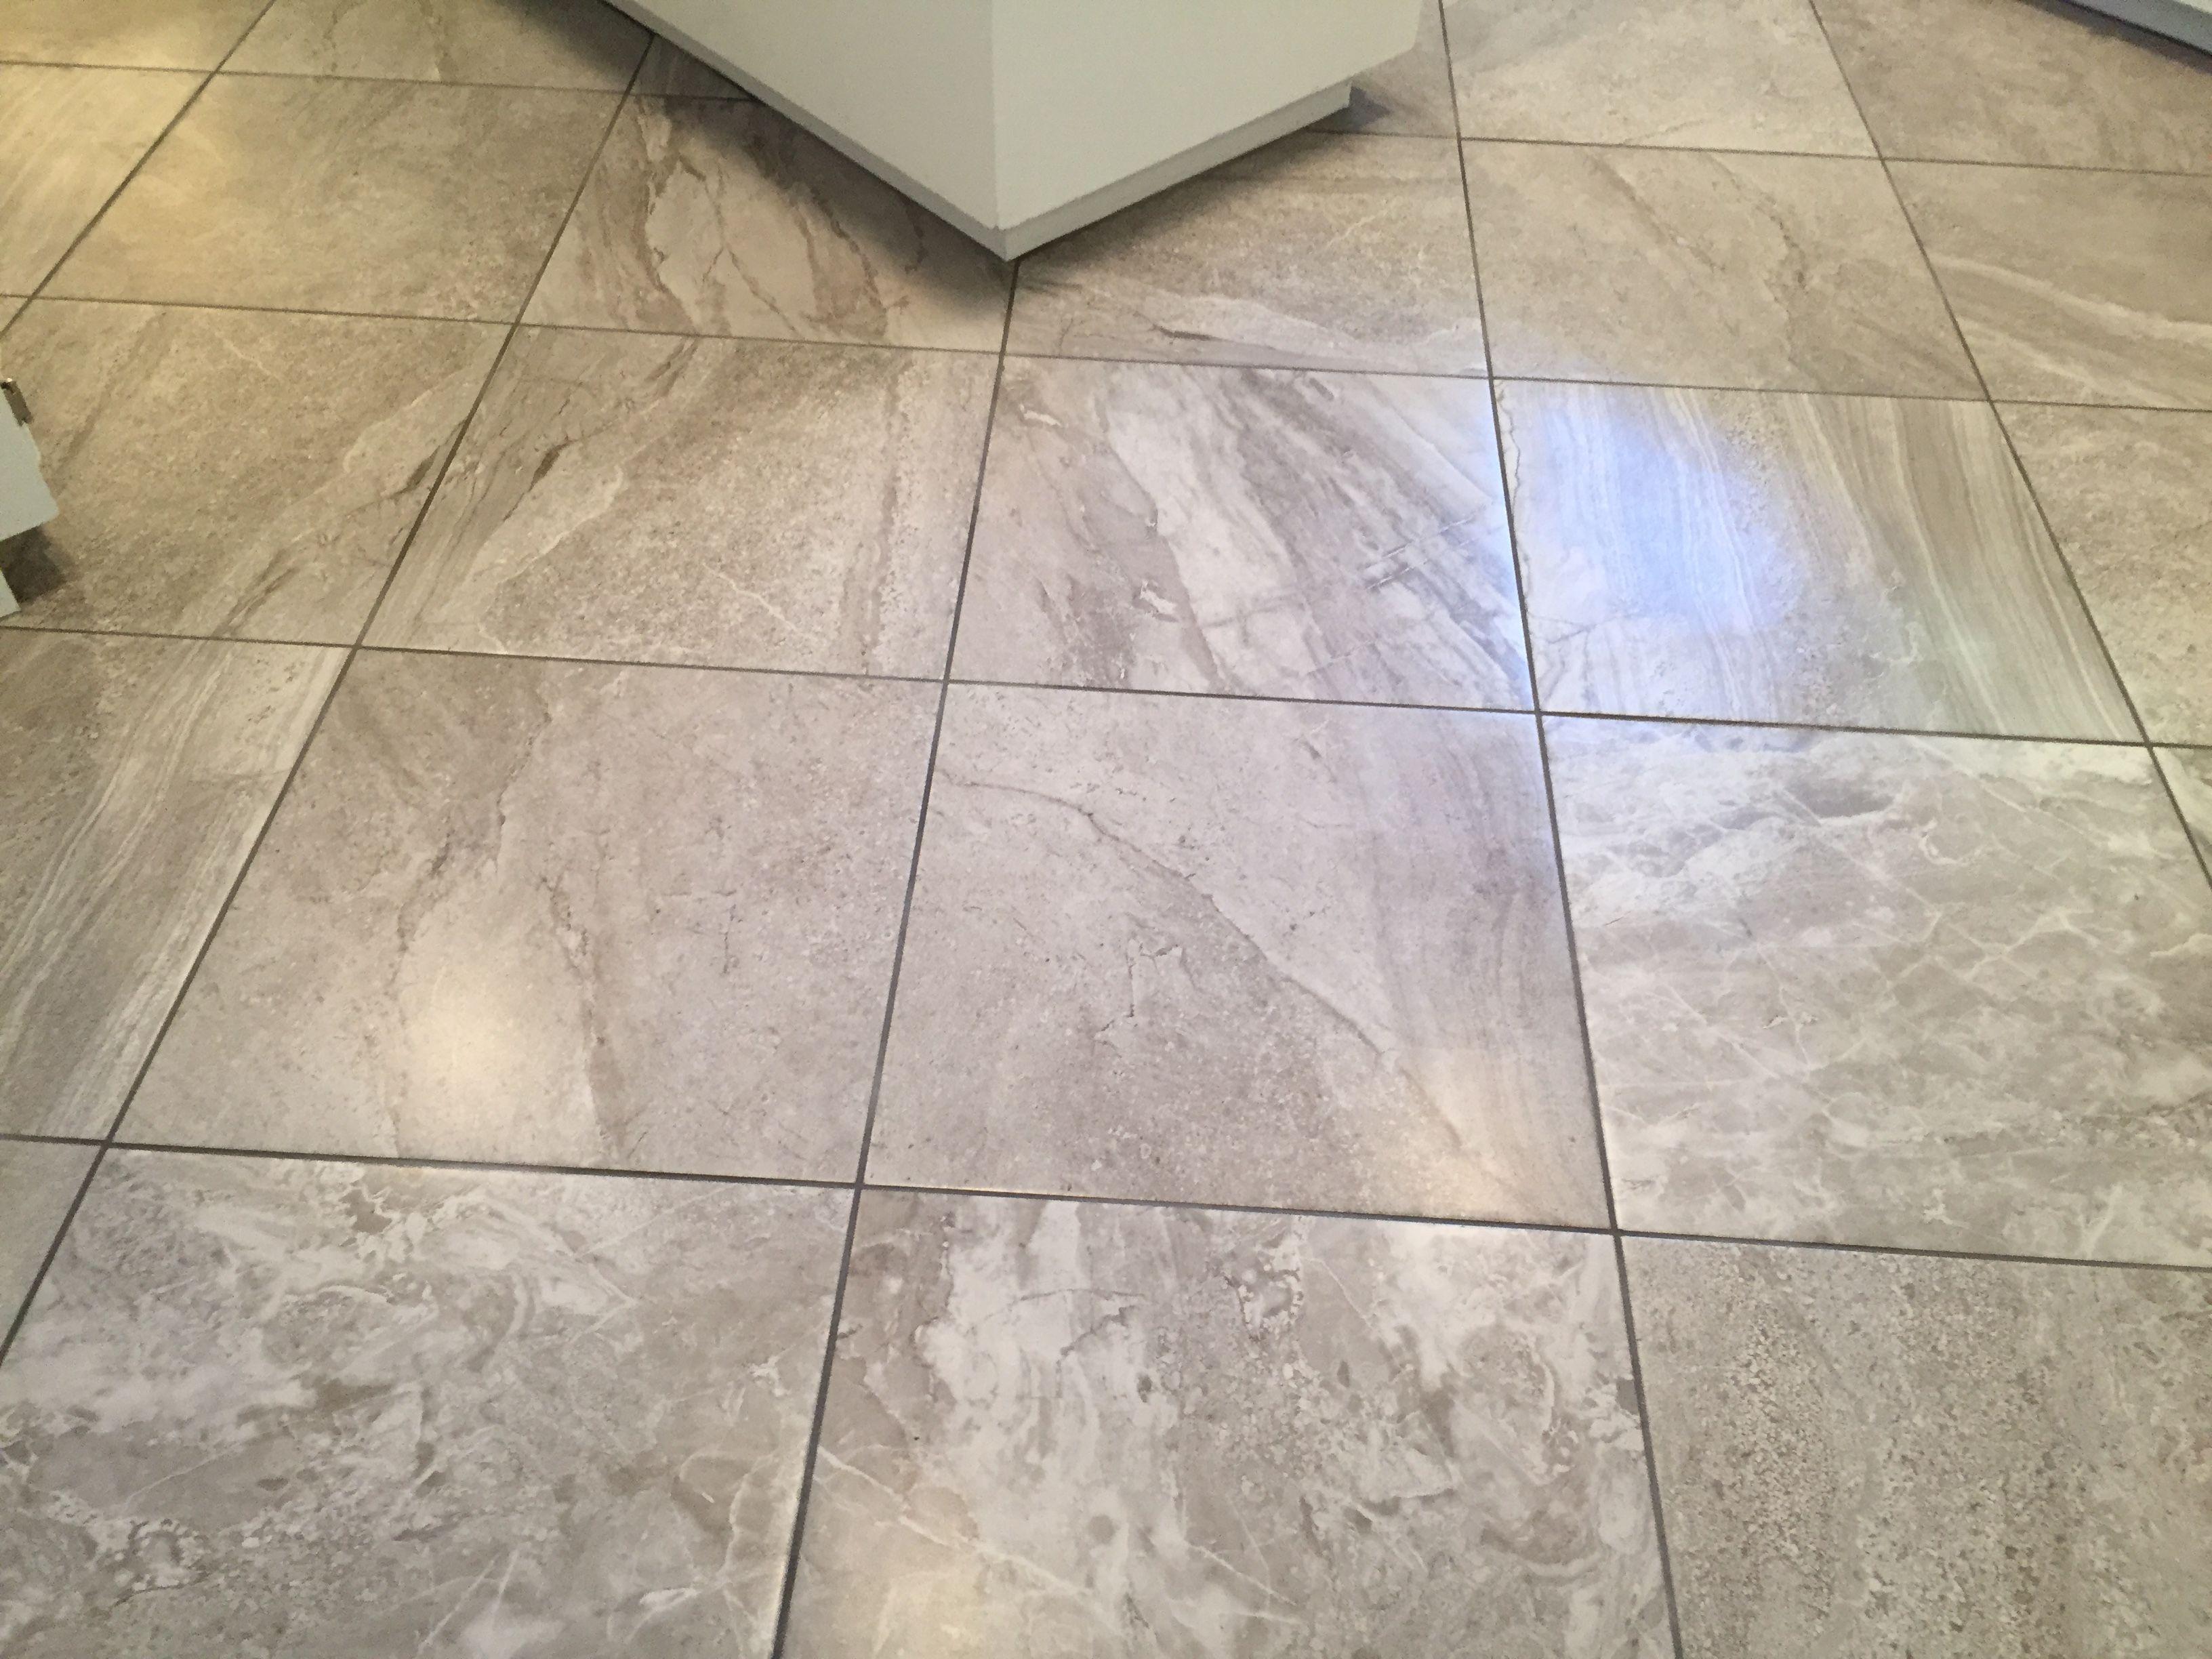 20x20 Tile Laid On The Diagonal Stone Flooring Tile Floor Flooring